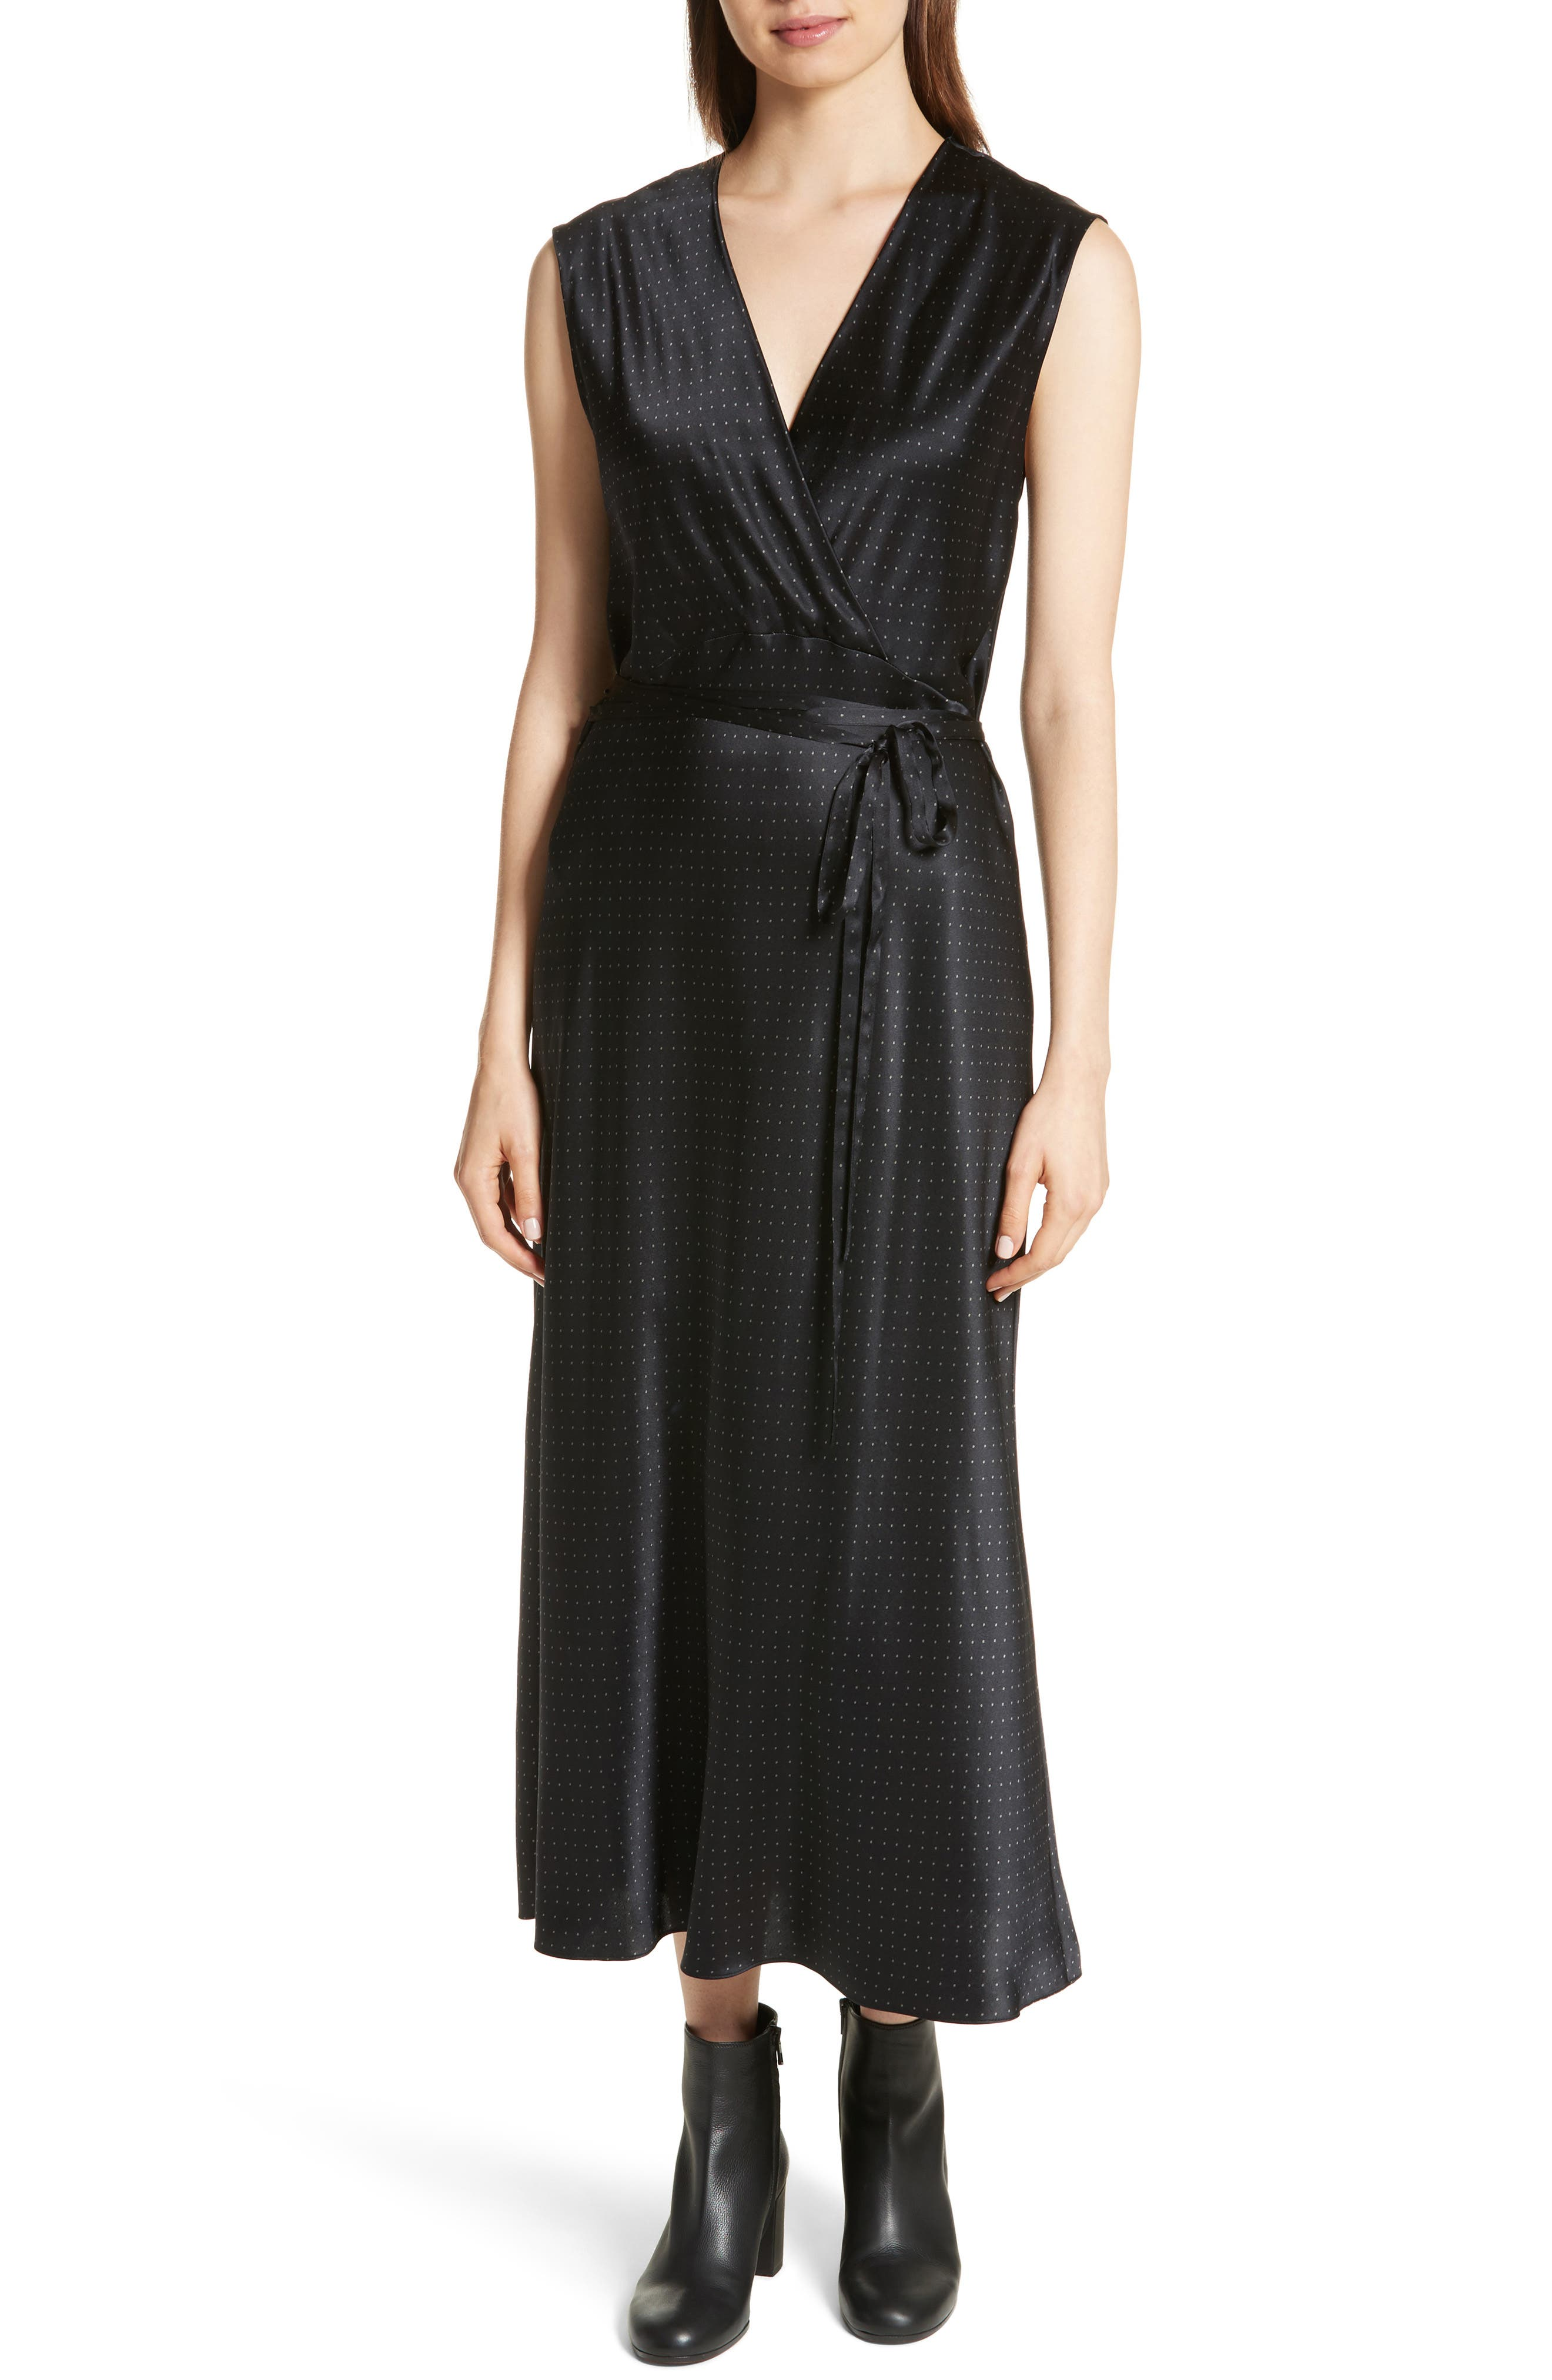 Vintage Polka Dot Faux Wrap Silk Dress,                         Main,                         color, Black/ Frog